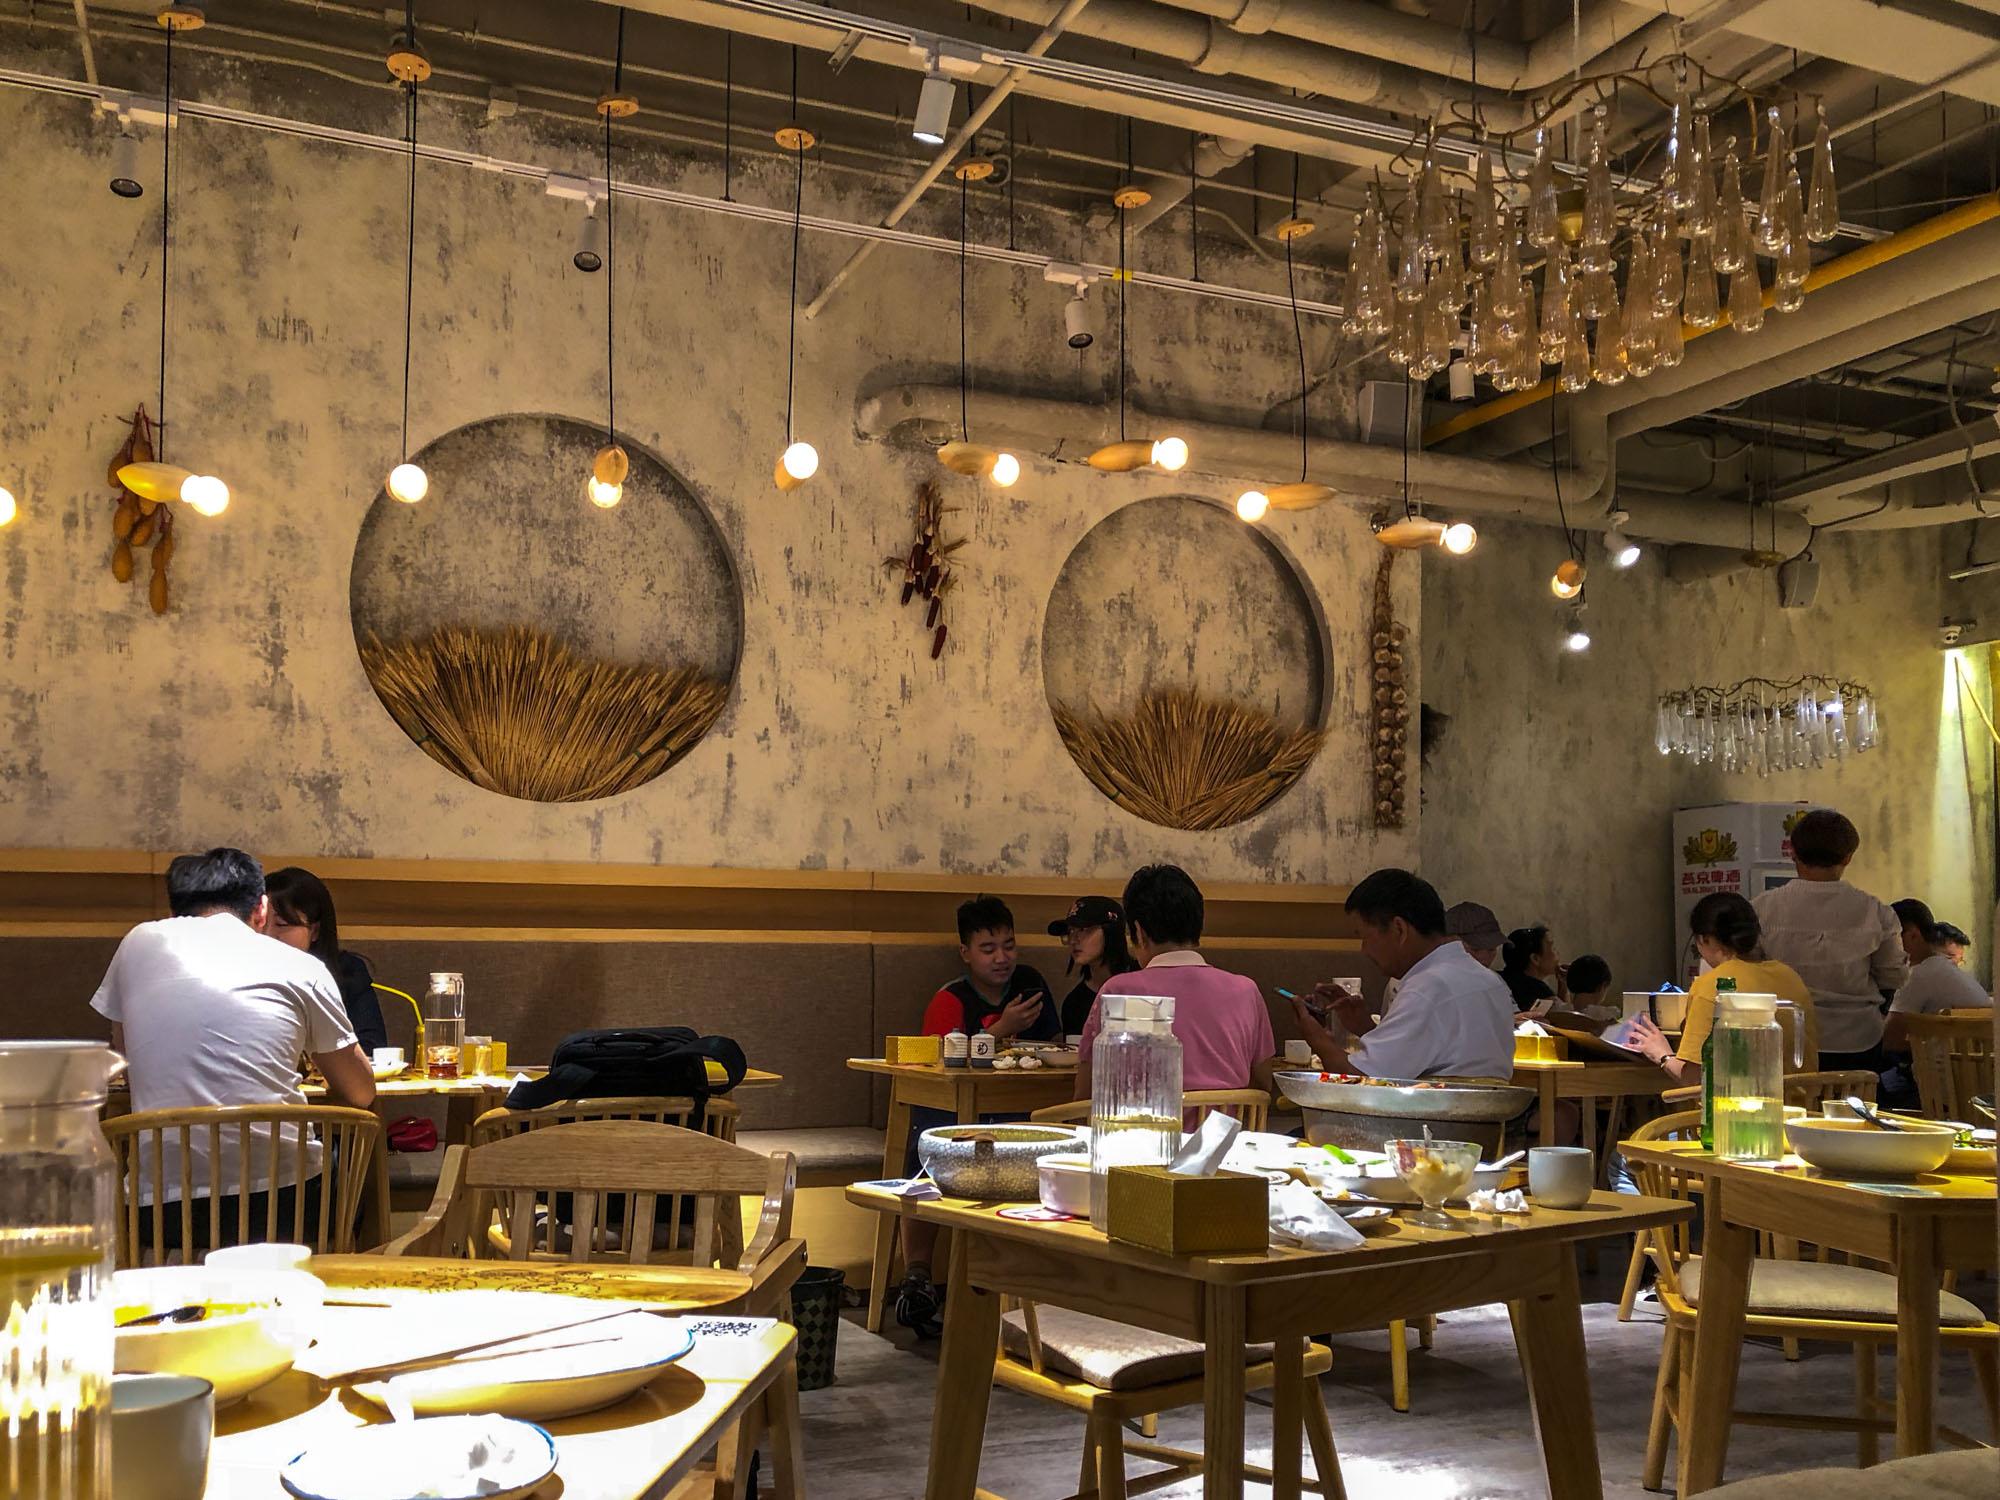 Beijing - 金谷雨妈妈菜 Golden Grain Gallery Restaurant